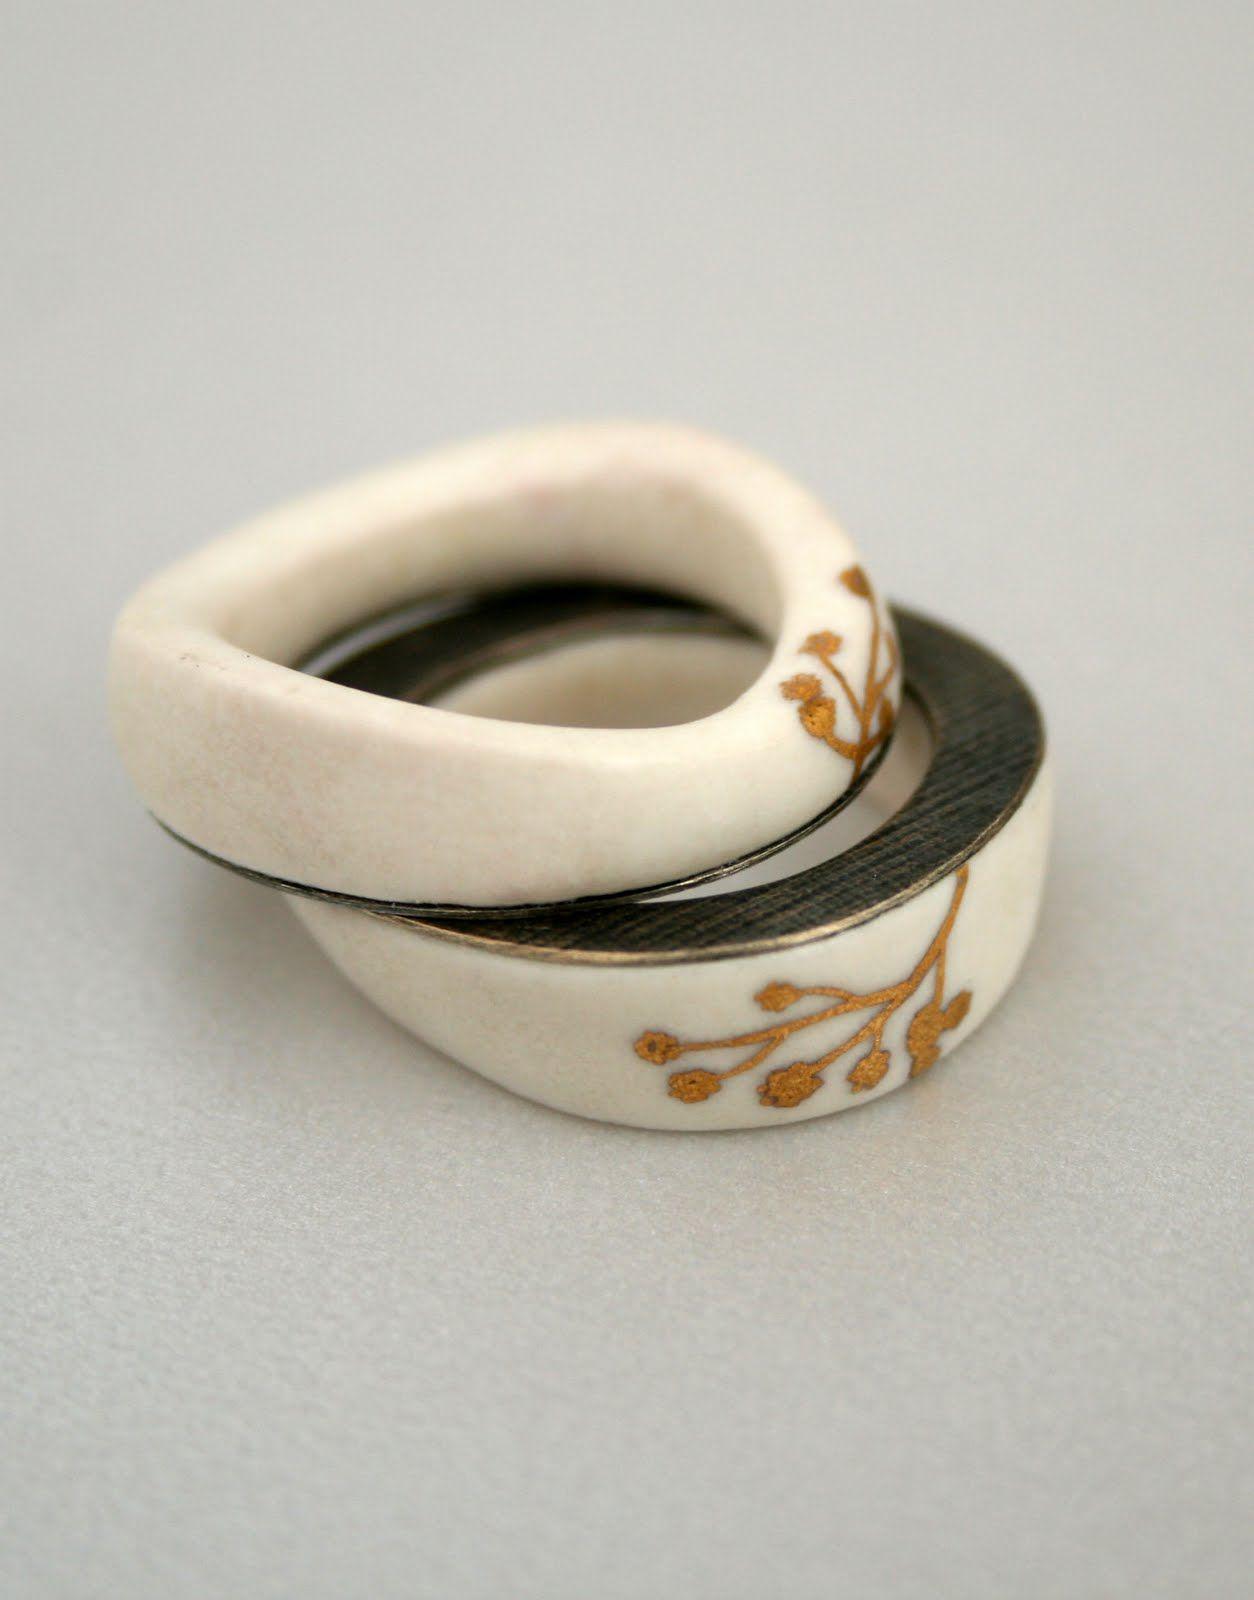 porcelain rings by Pilar Cotter